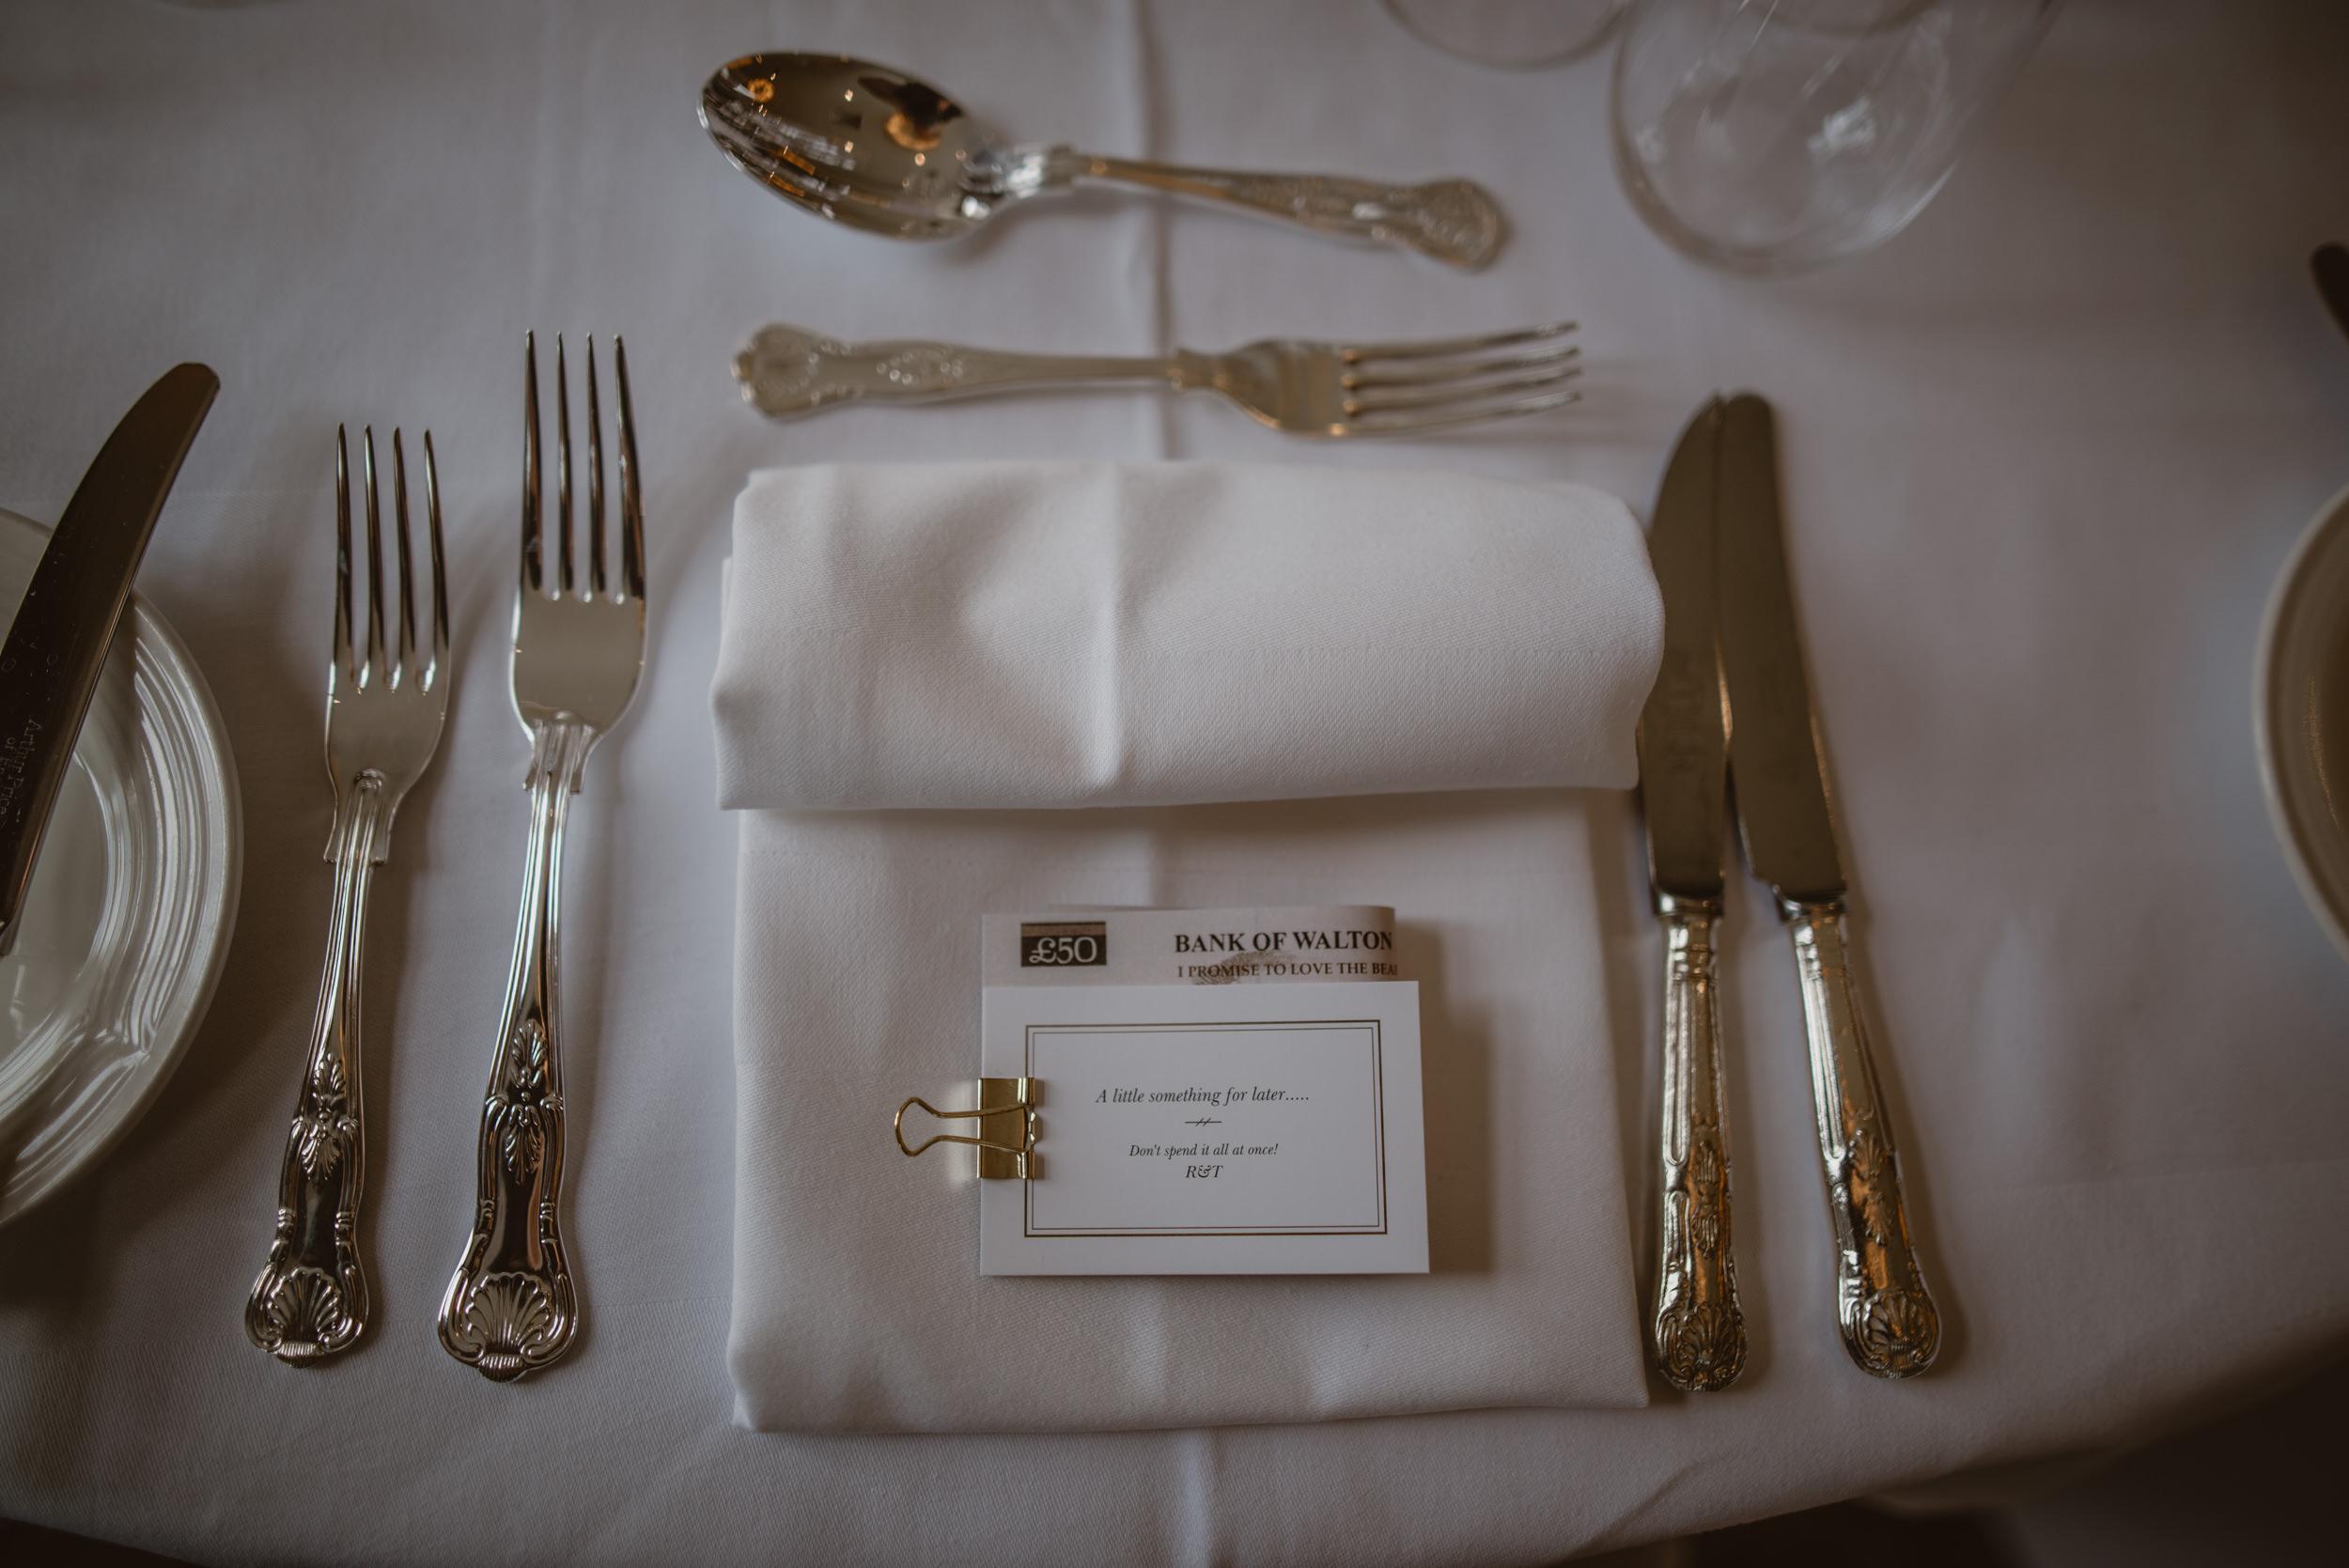 Trisha-and-Roger-wedding-The-Priory-Church-and-Chewton-Glen-Hotel-Christchurch-Manu-Mendoza-Wedding-Photography-262.jpg